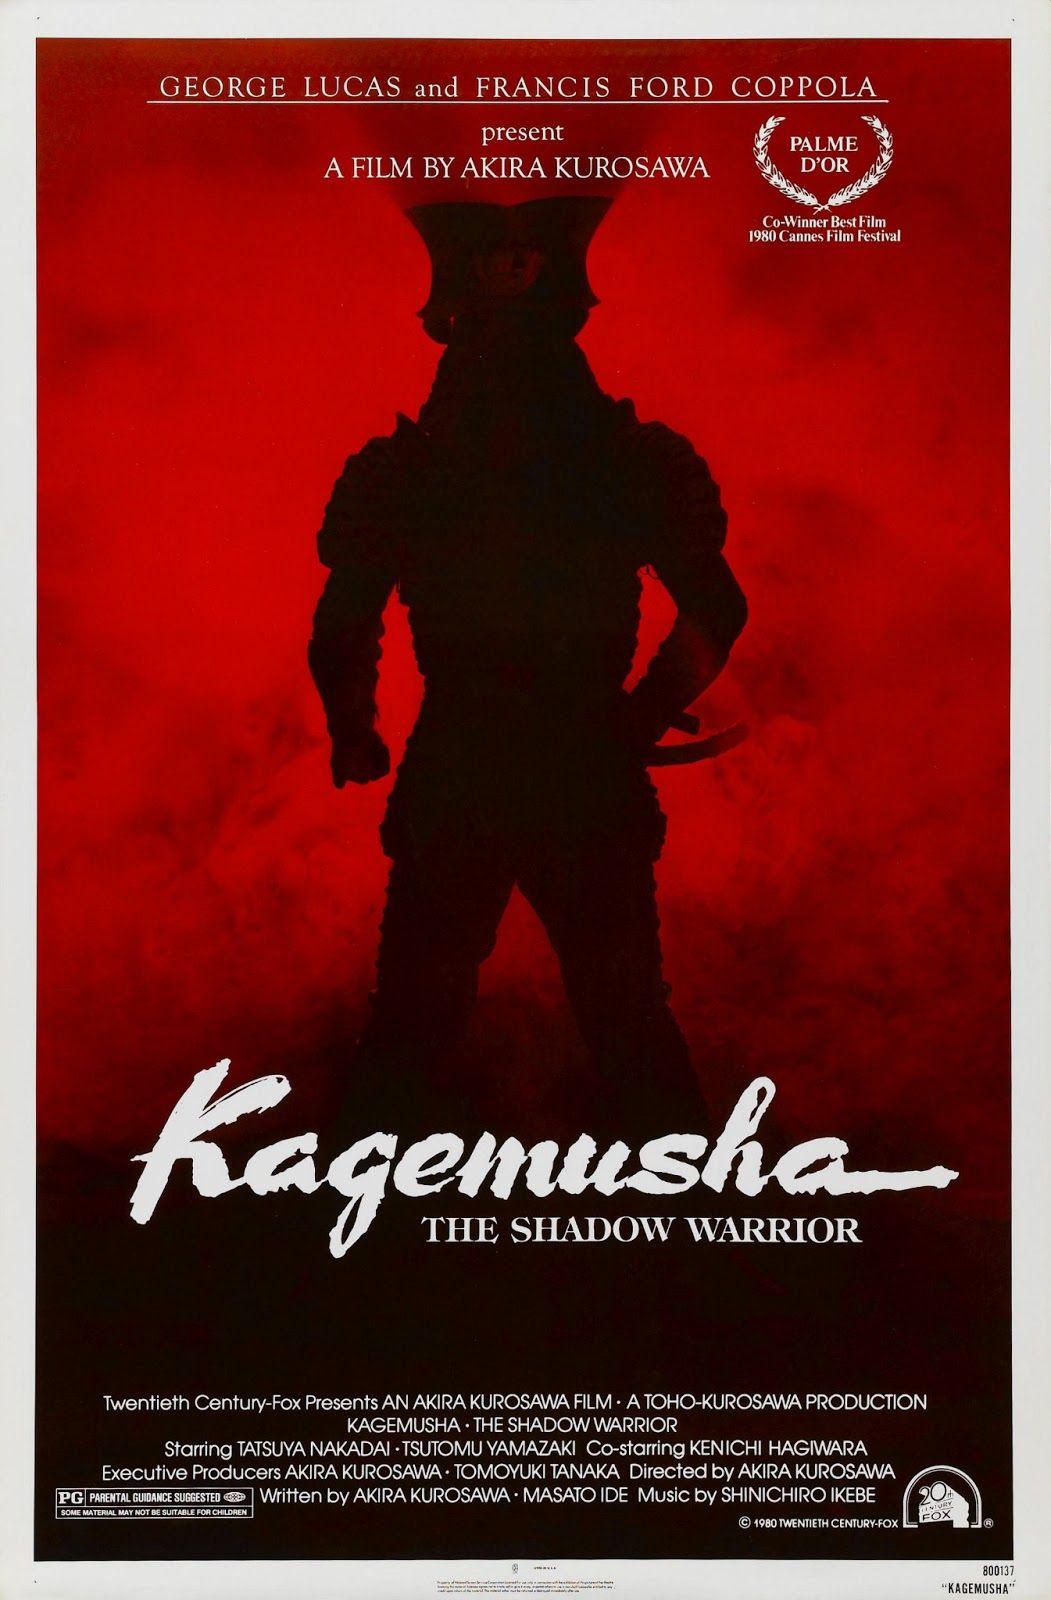 Kagemusha – a sombra de um samurai (1980) | Akira Kurosawa